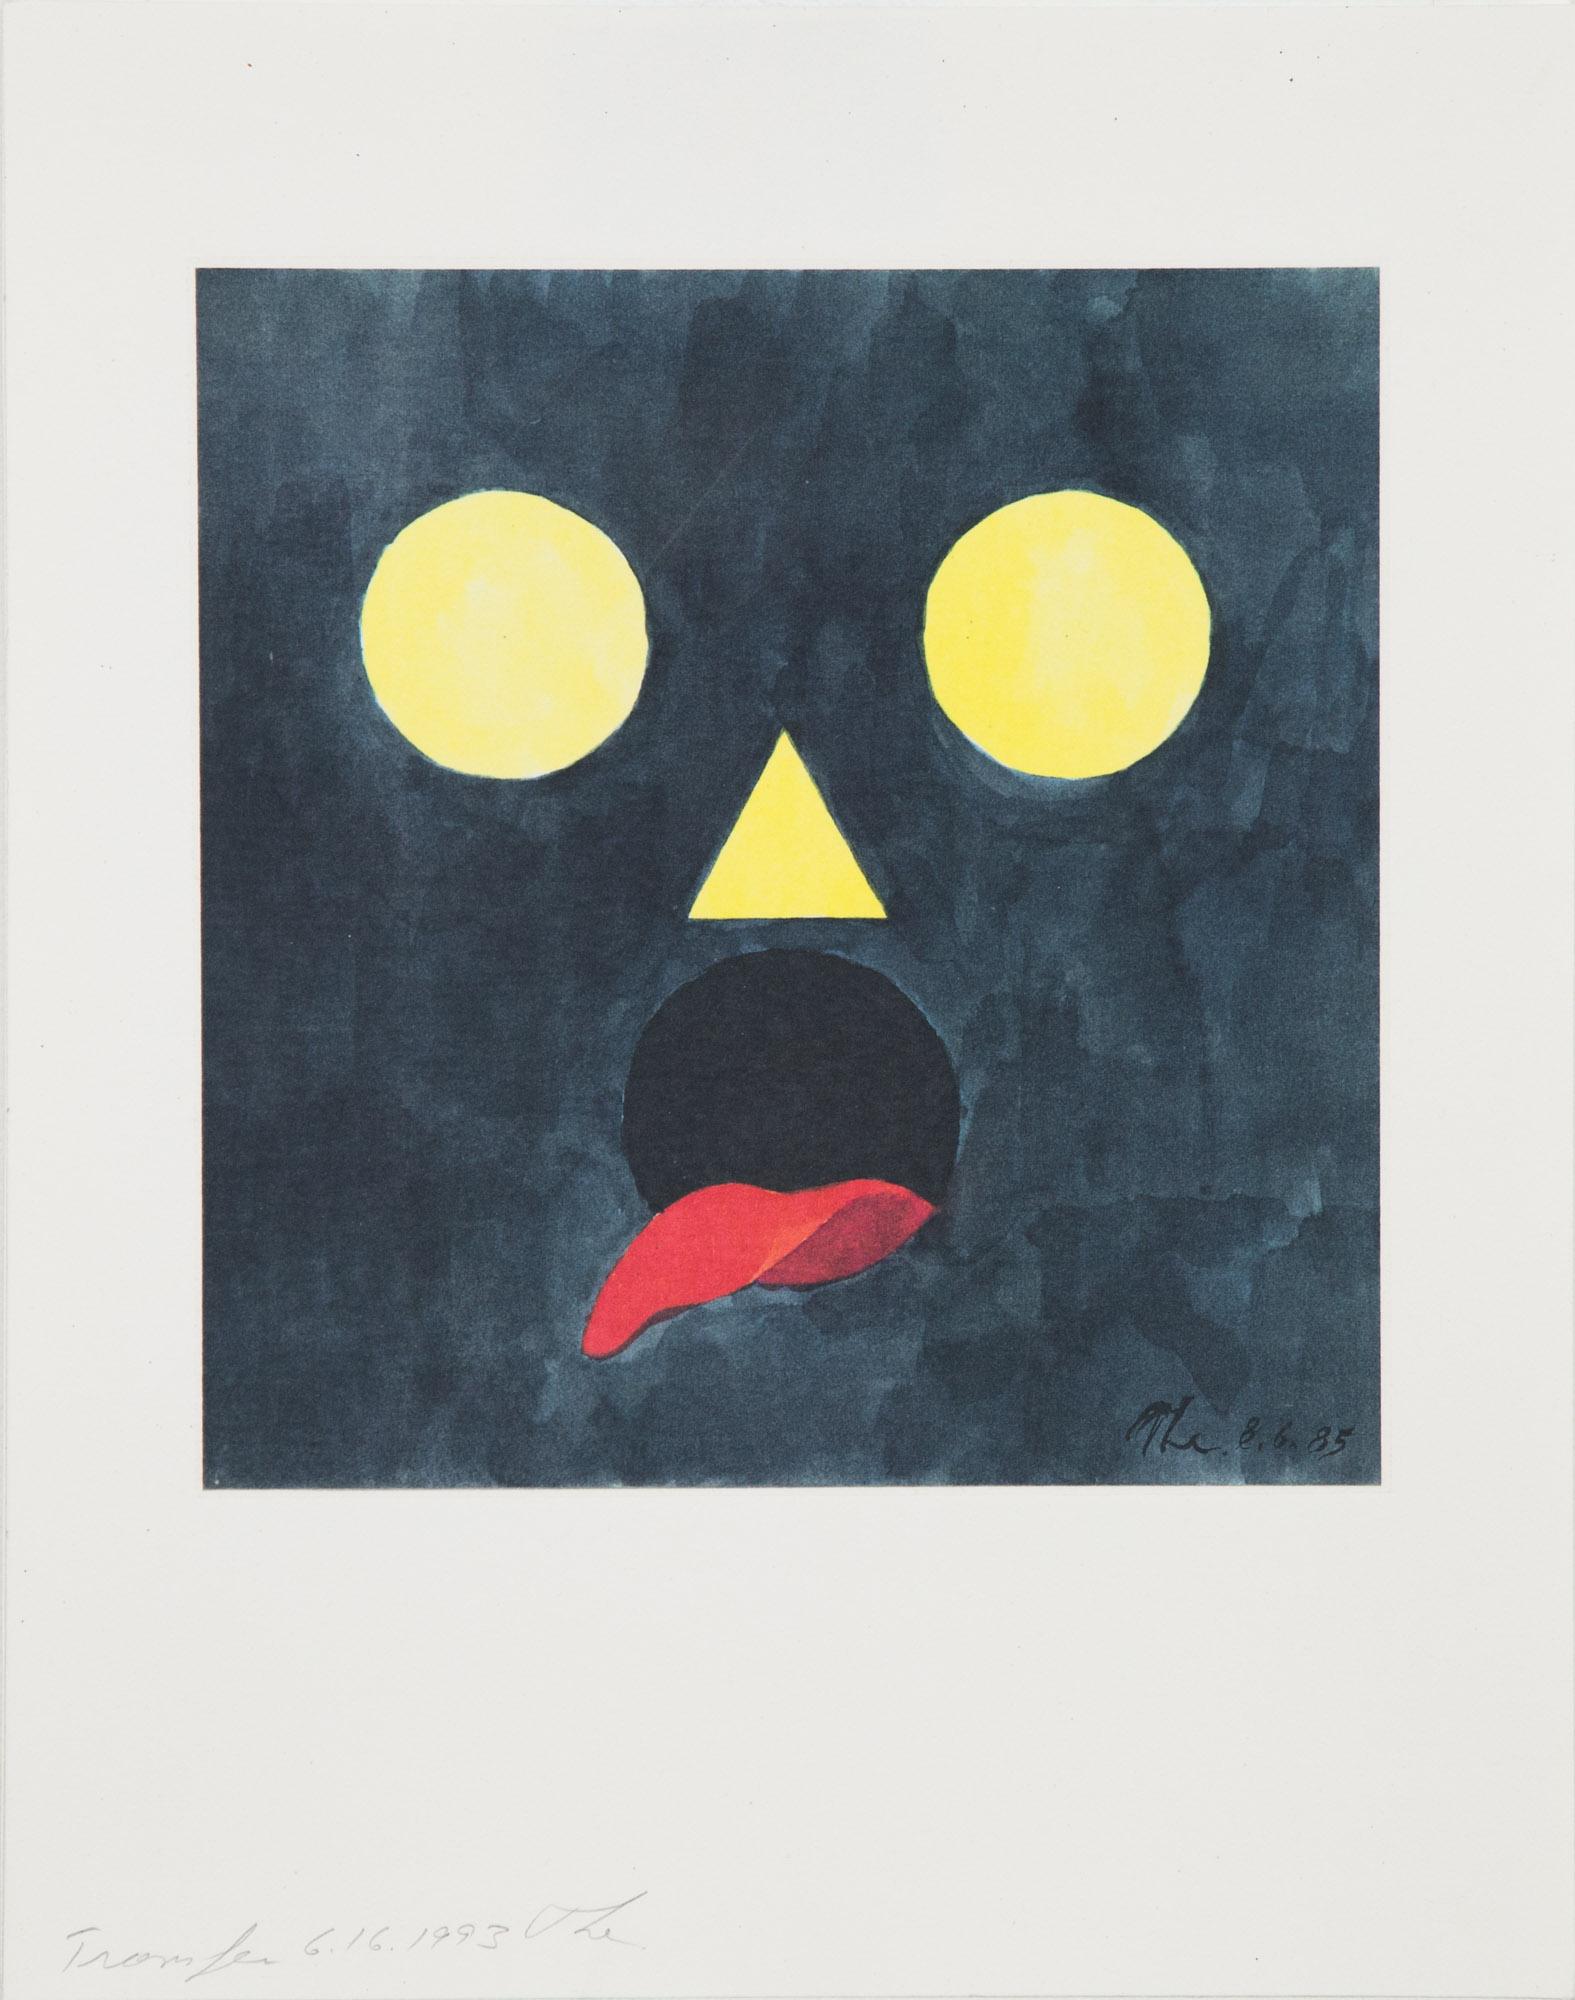 Theodore Titolo,  Untitled , 1993, transfer print, 14 x 11 in